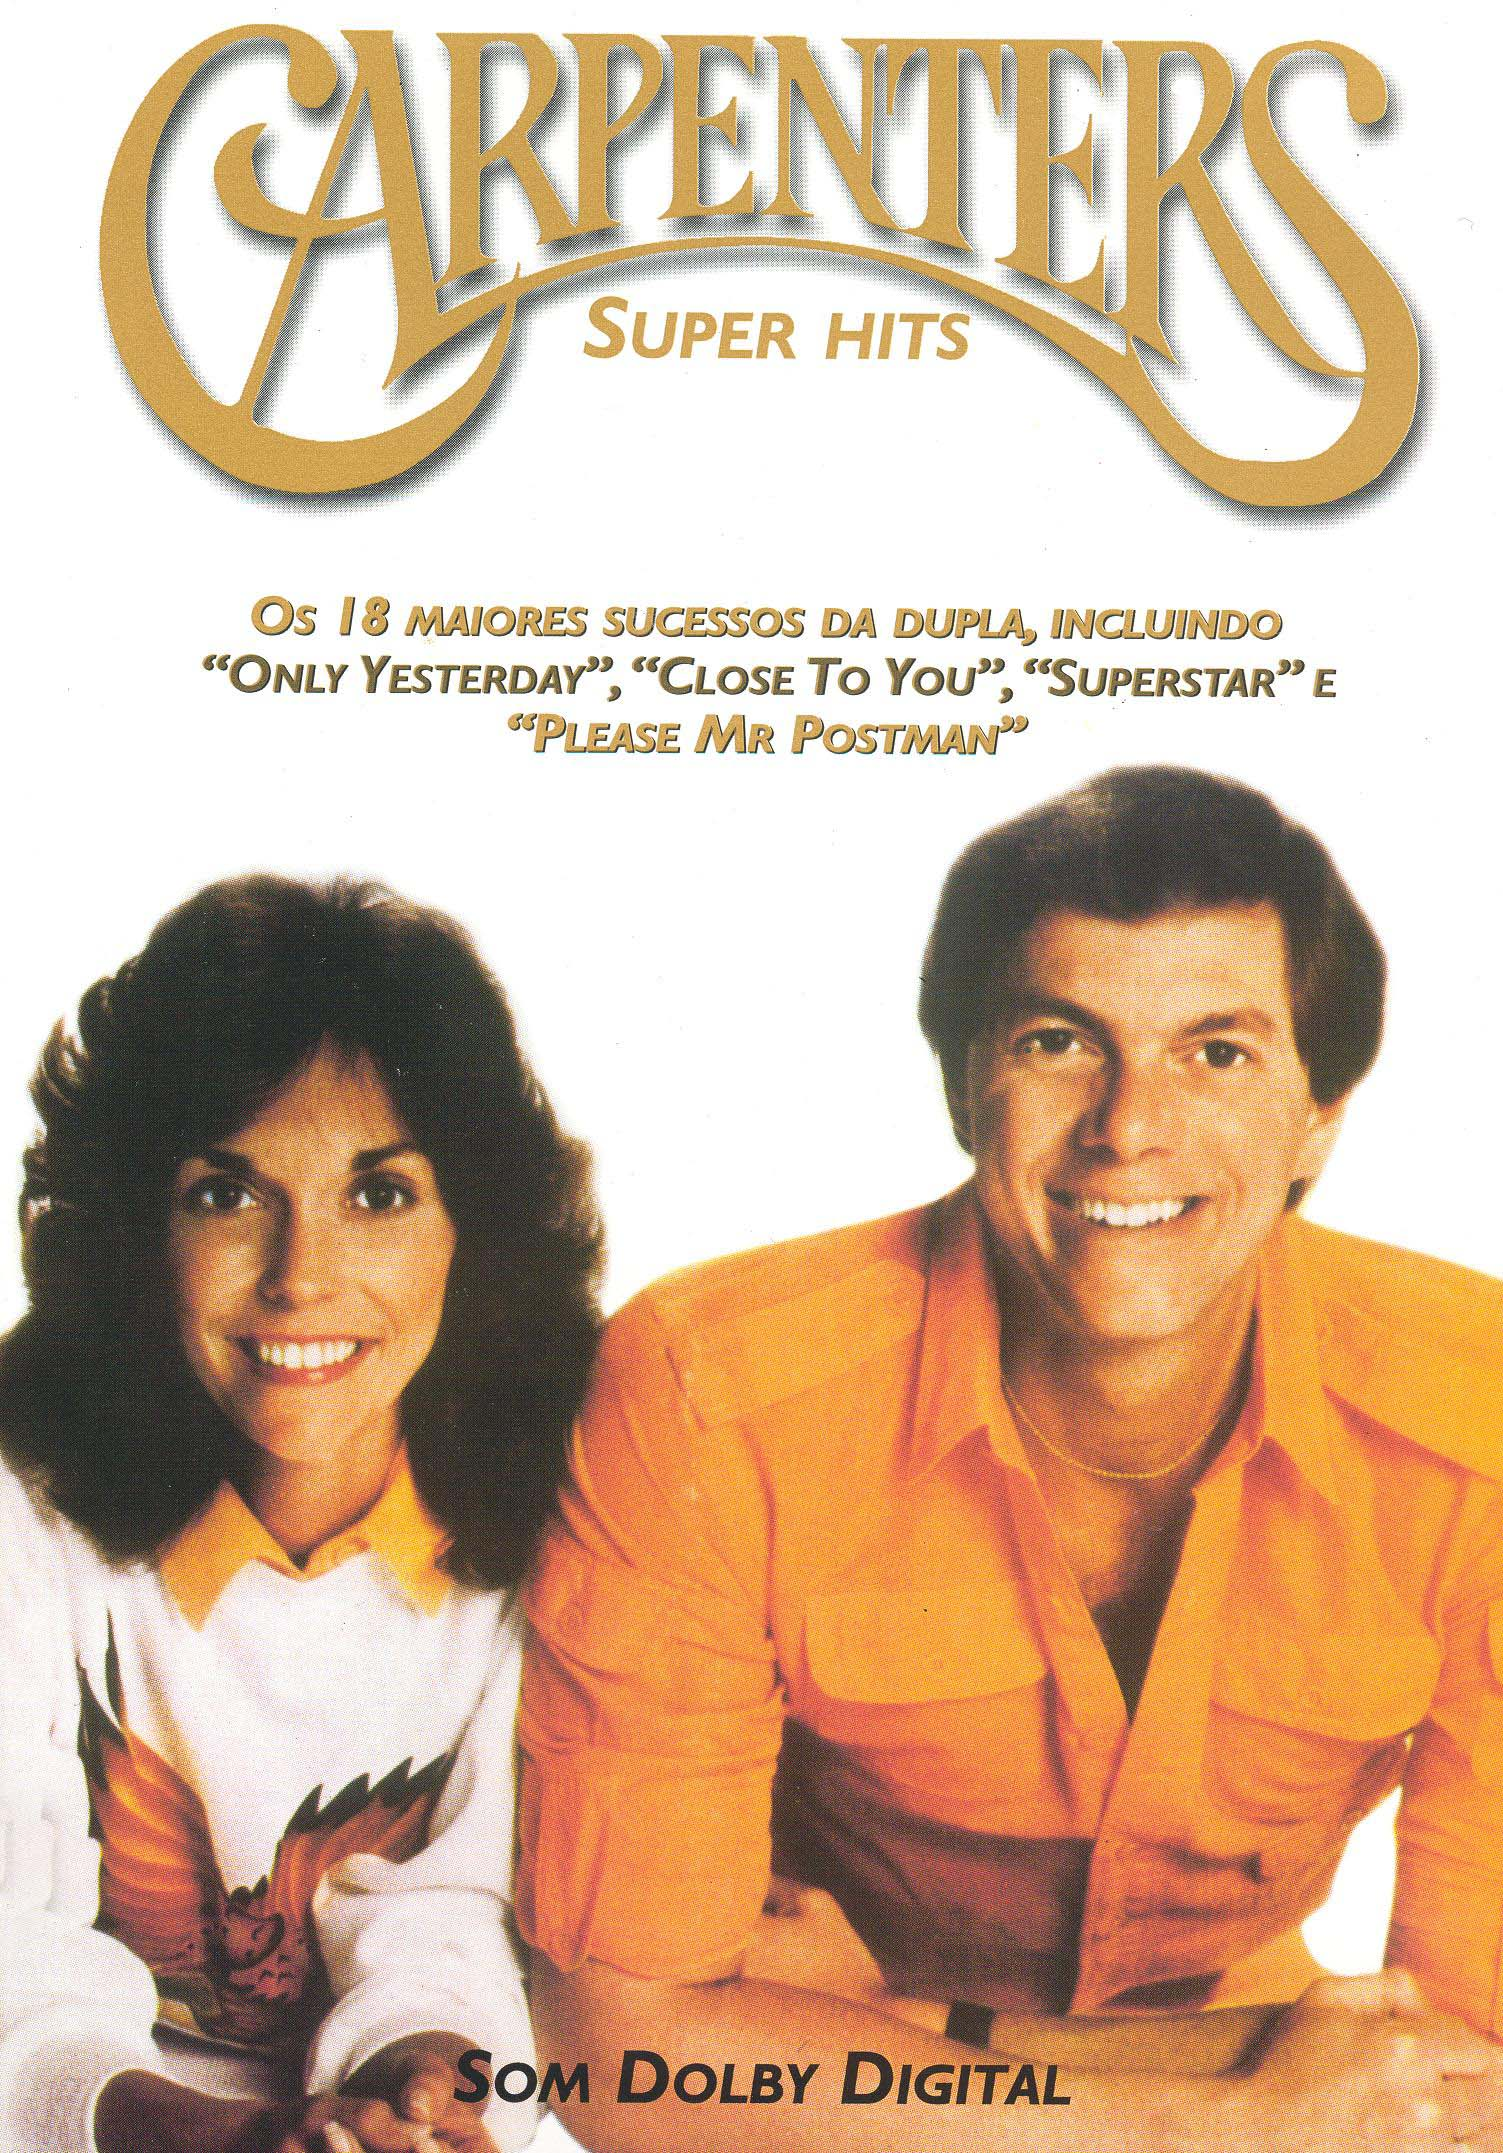 The Carpenters: Super Hits